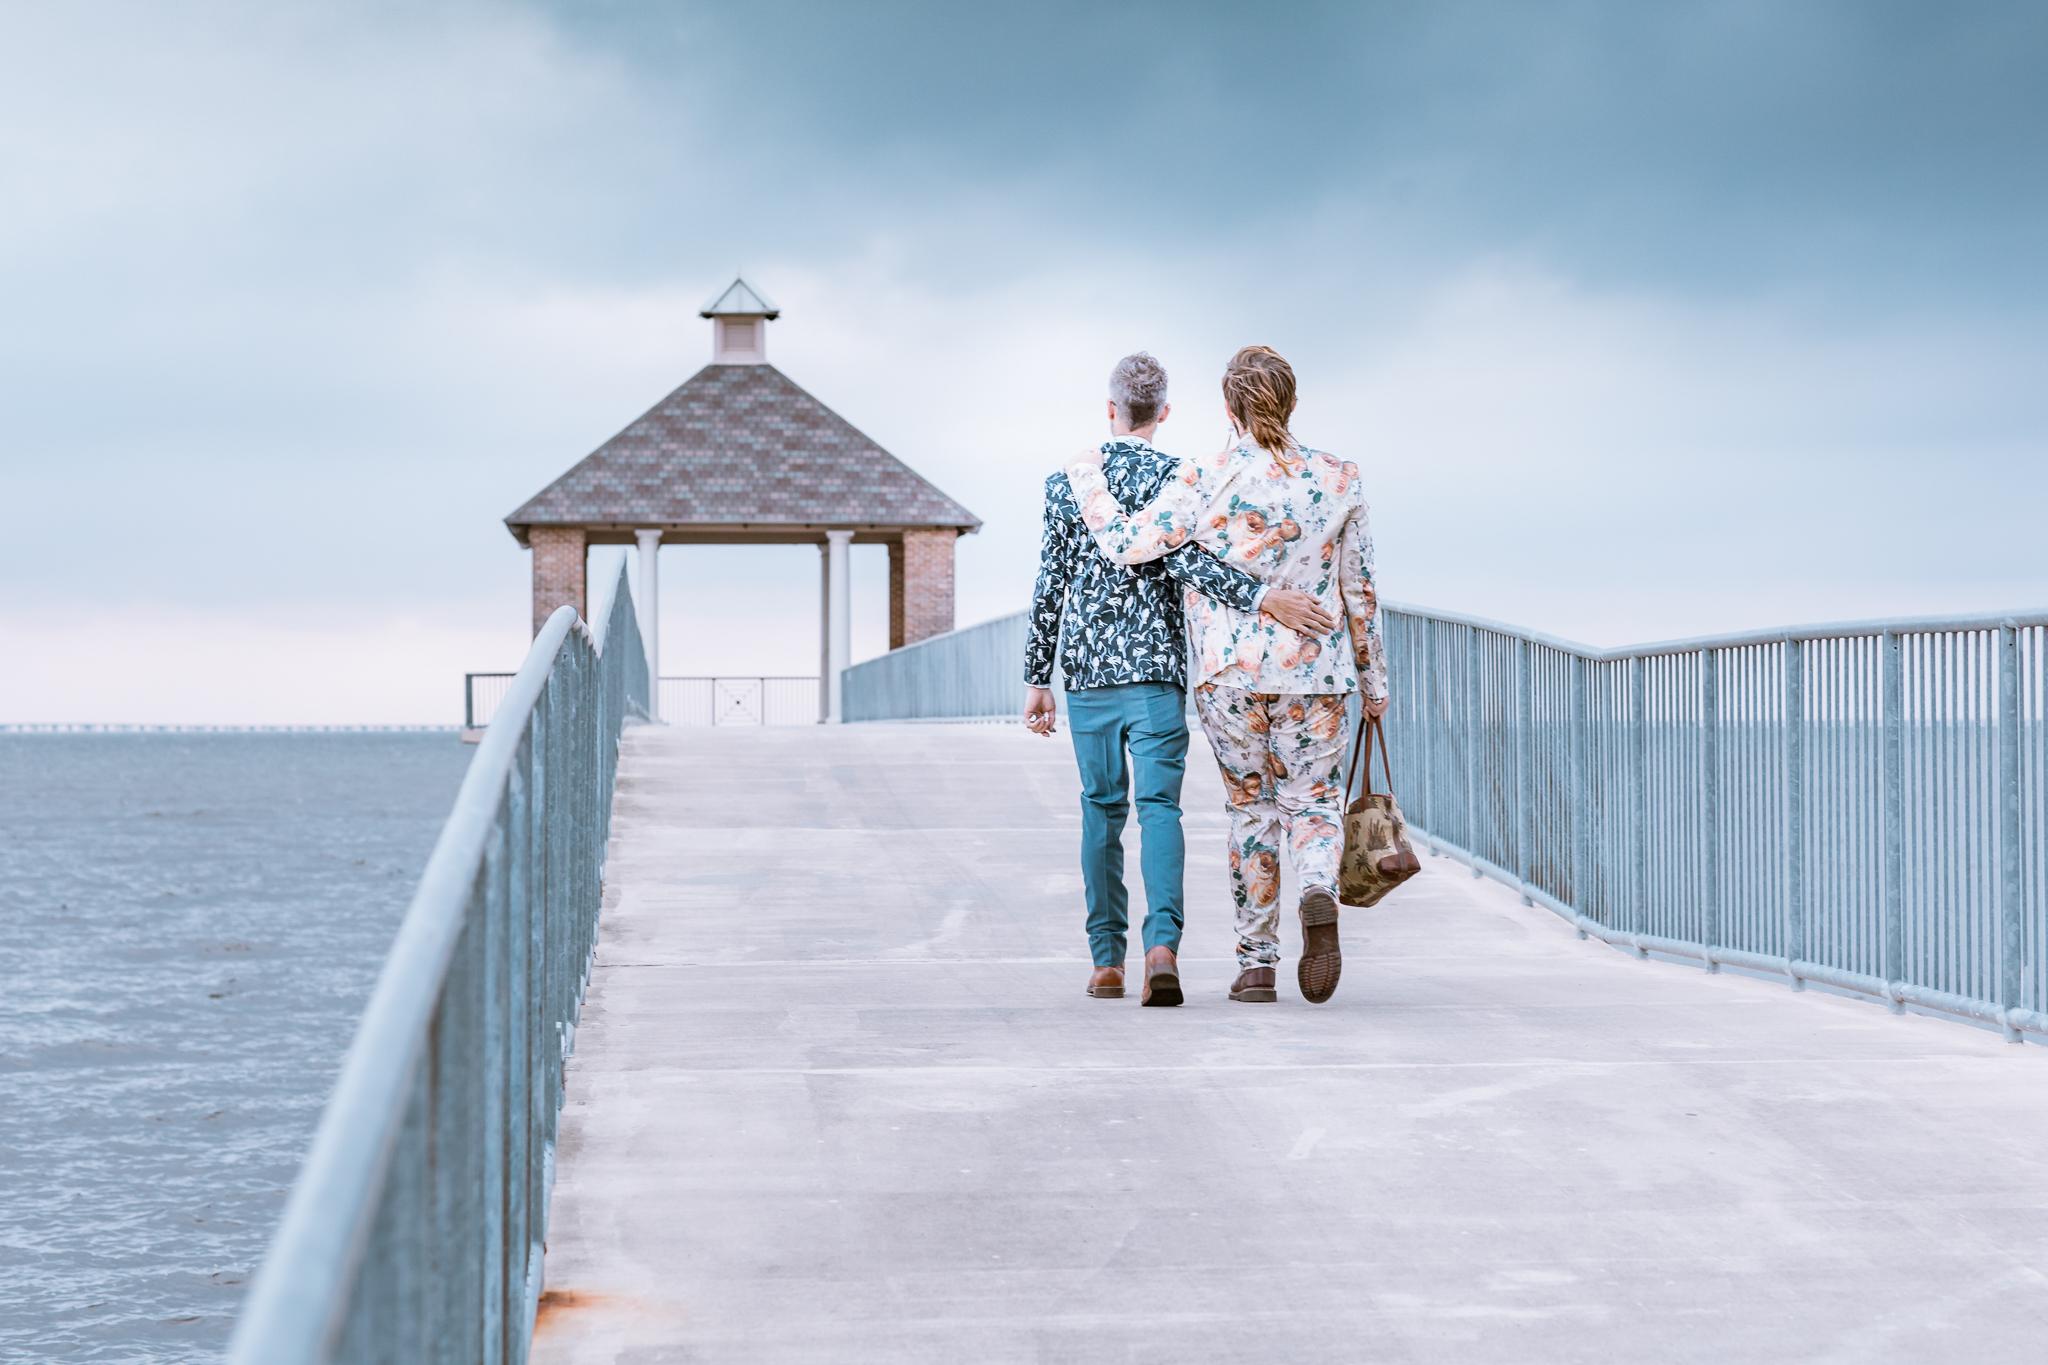 Tim and David - New orleans Wedding - Kallistia Photography-9.jpg